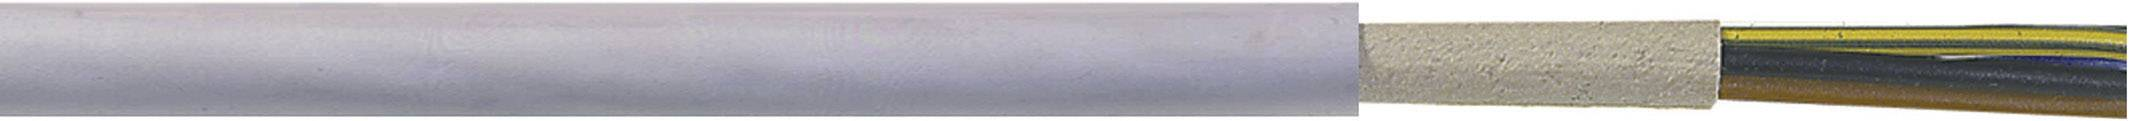 Opláštené vedenie LappKabel NYM-J 1600012, 1 G 16 mm², 50 m, sivá